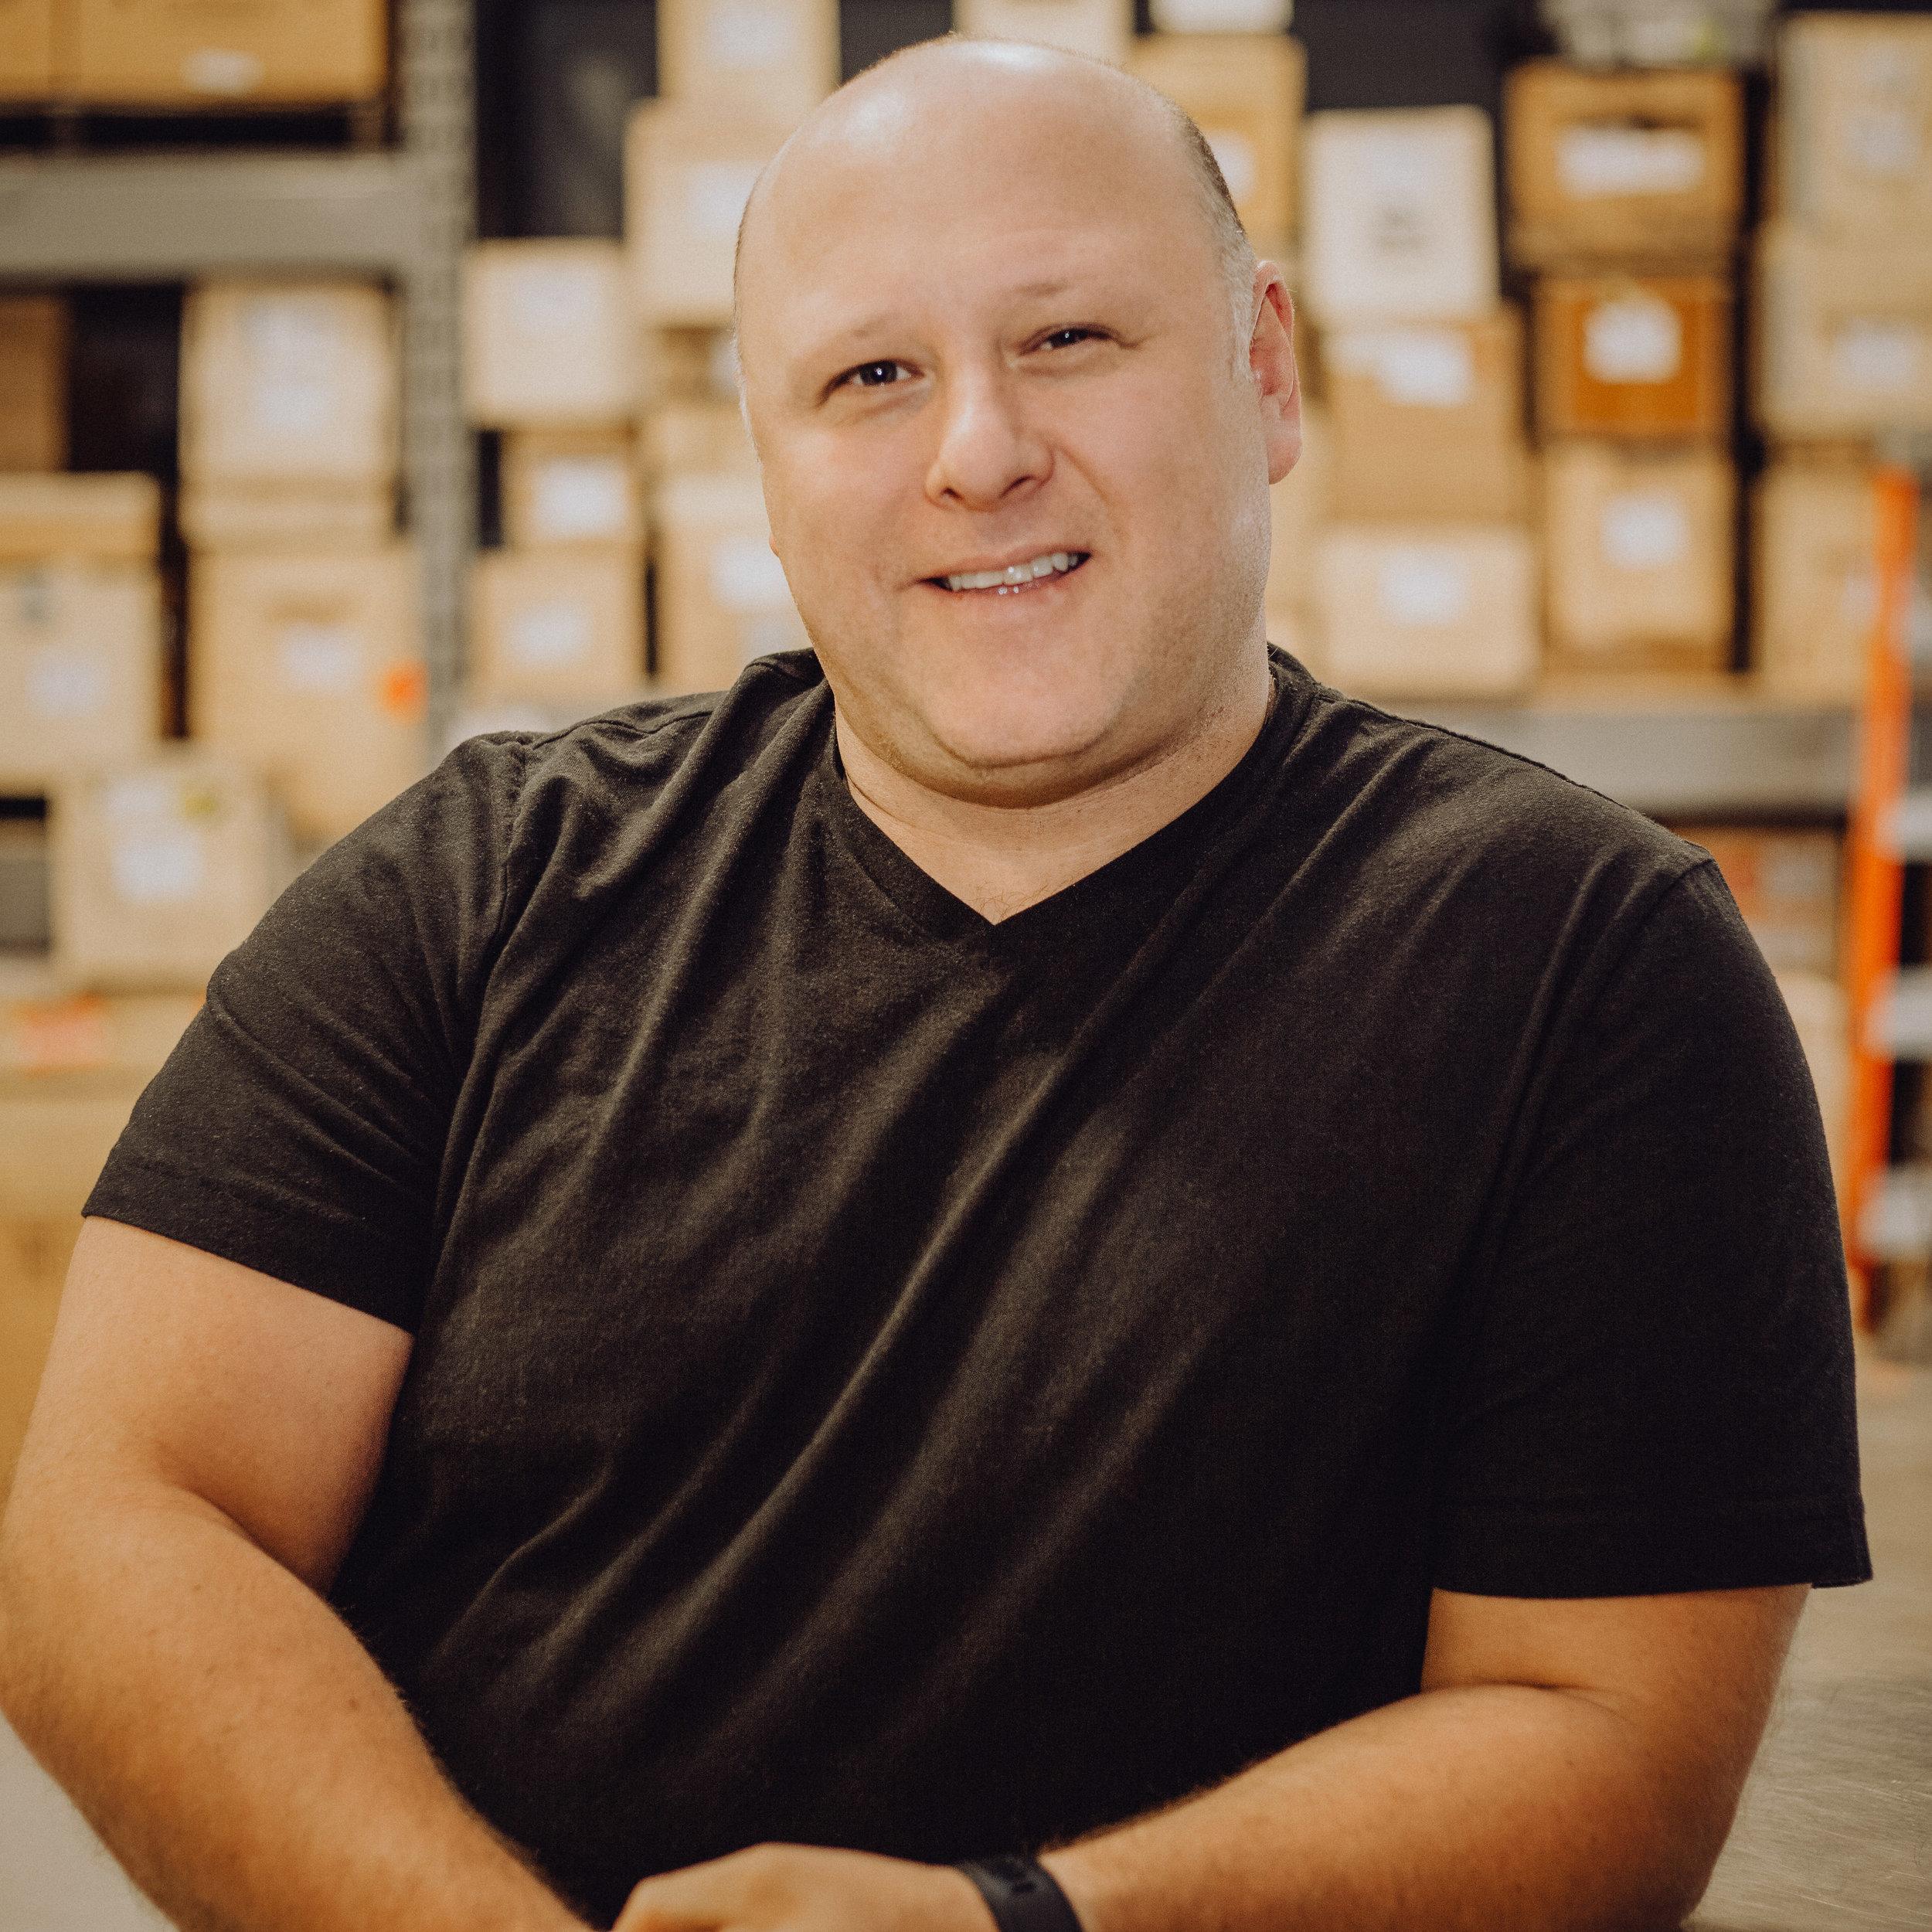 Alexandre Lajoie - Customer Service